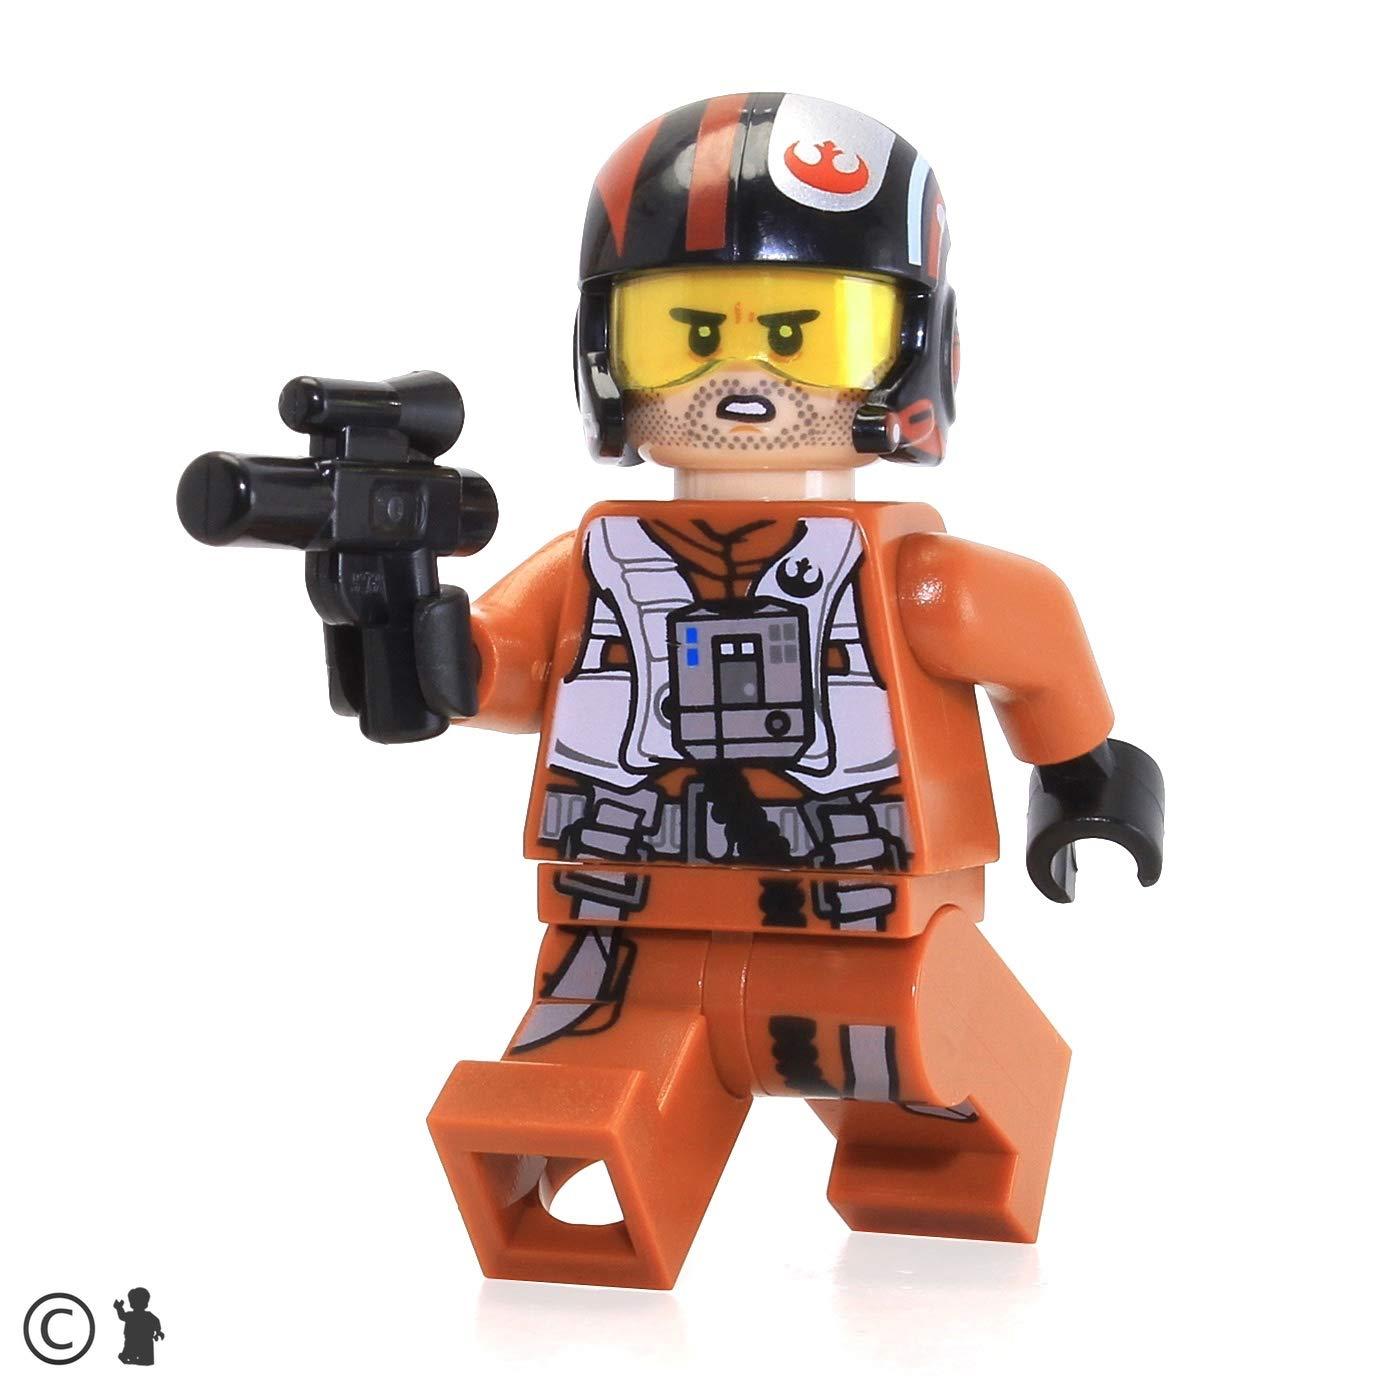 TROS Poe Dameron Lego MF 2